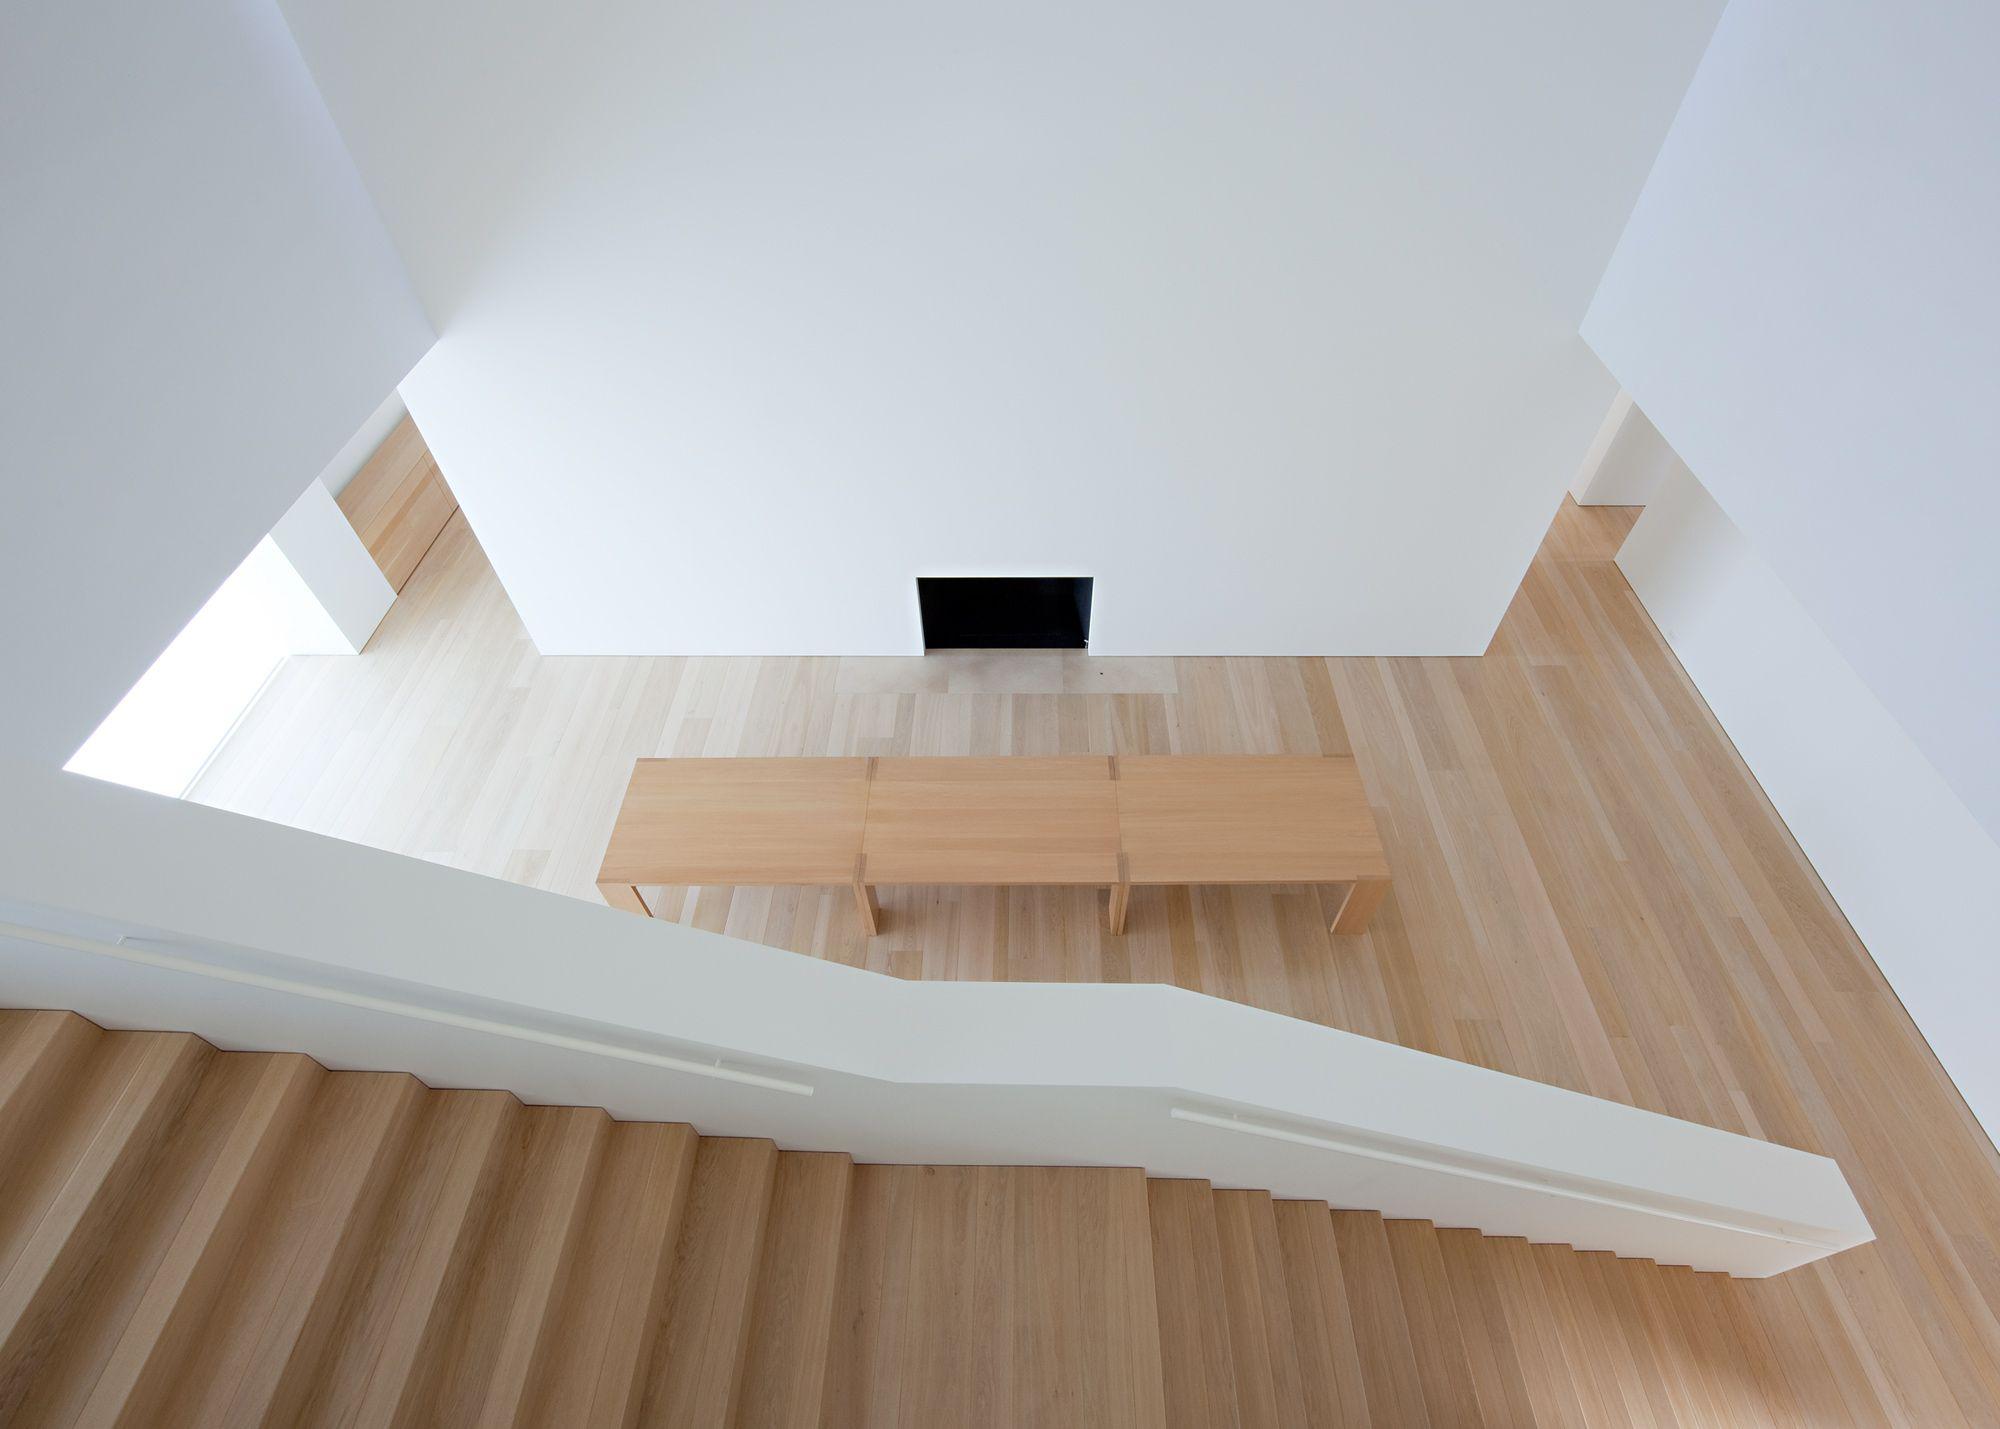 Best John Pawson Minimalism Interior Wood Staircase John Pawson 640 x 480